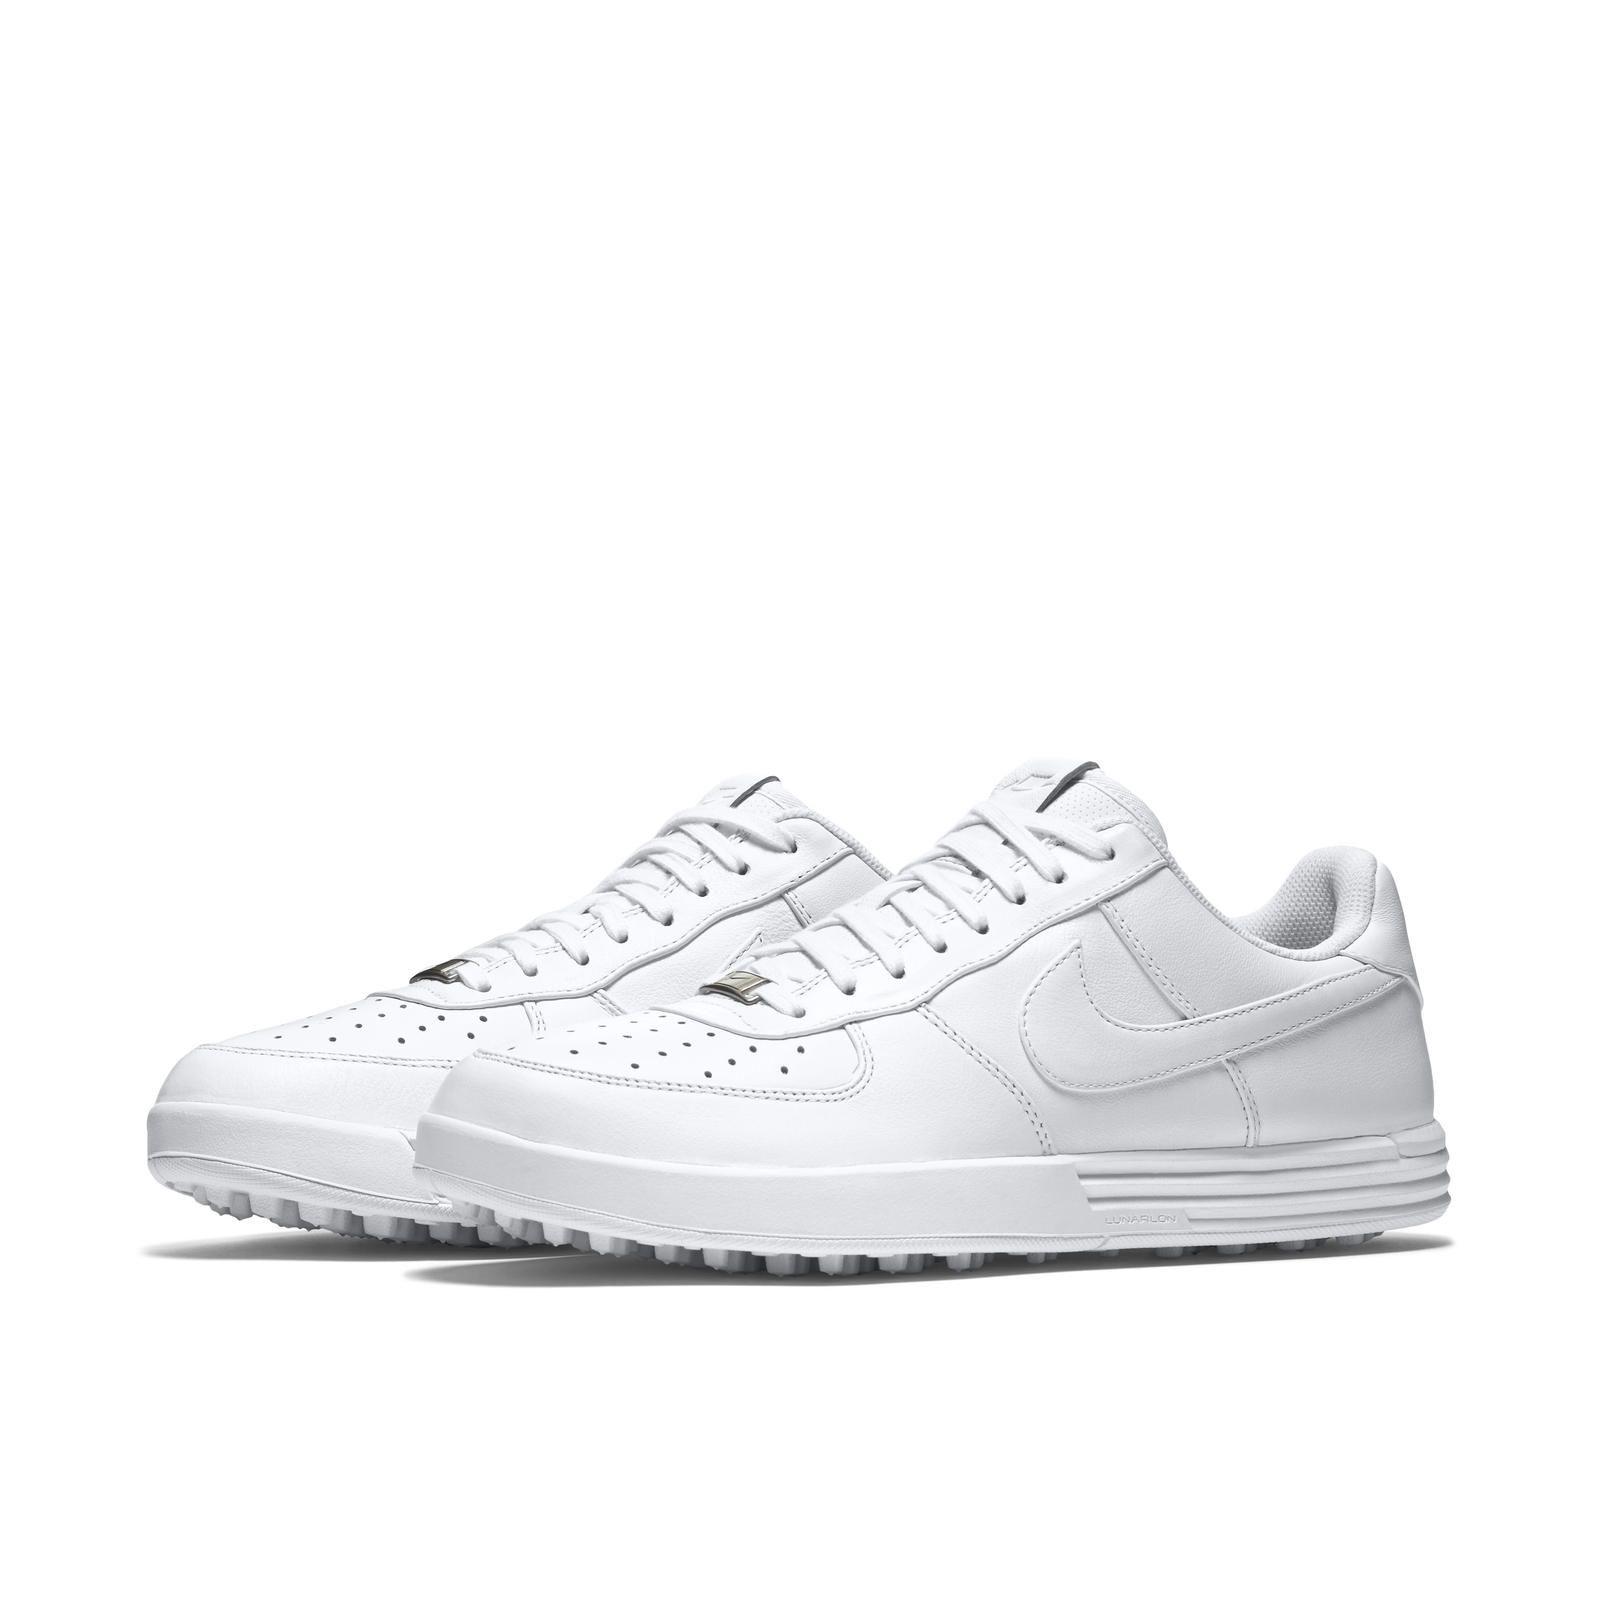 Nike's New Lunar Force 1G Golf Shoe